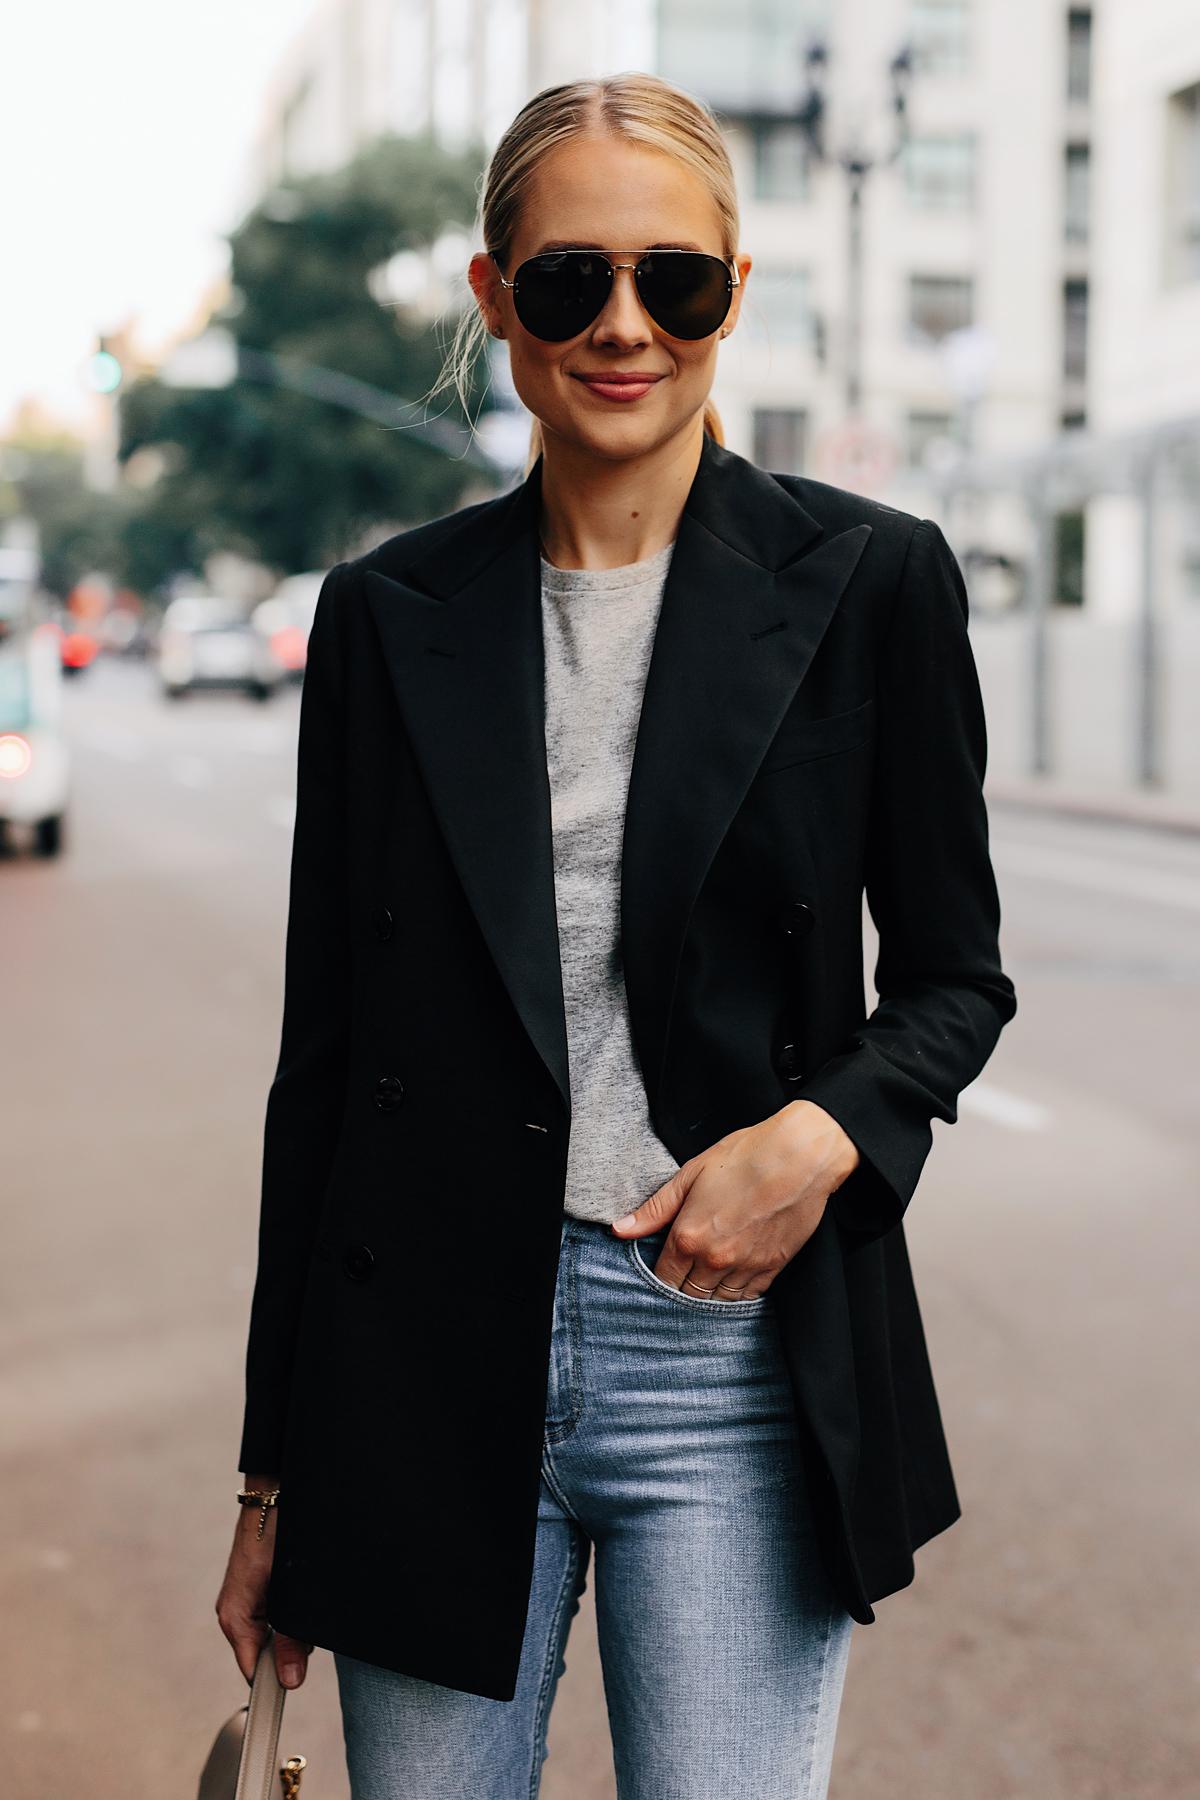 Blonde Woman Wearing Ralph Lauren Polo Black Blazer Grey Tshirt Jeans Outfit Fashion Jackson San Diego Fashion Blogger Street Style